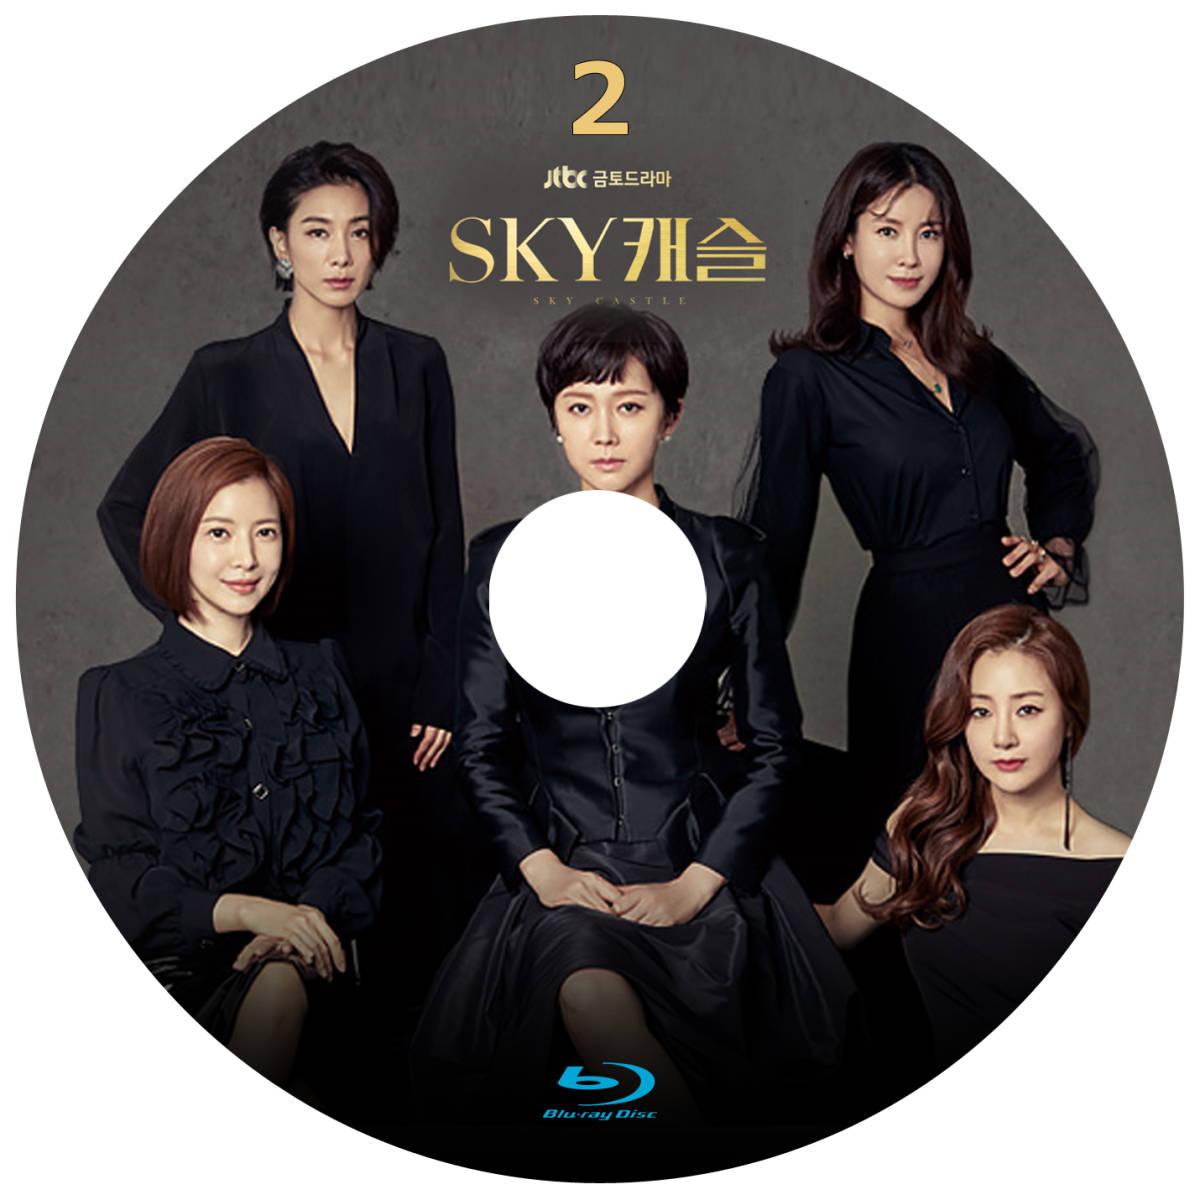 SKYキャッスル Blu-ray版 (2枚SET)《日本語字幕あり》 韓国ドラマ